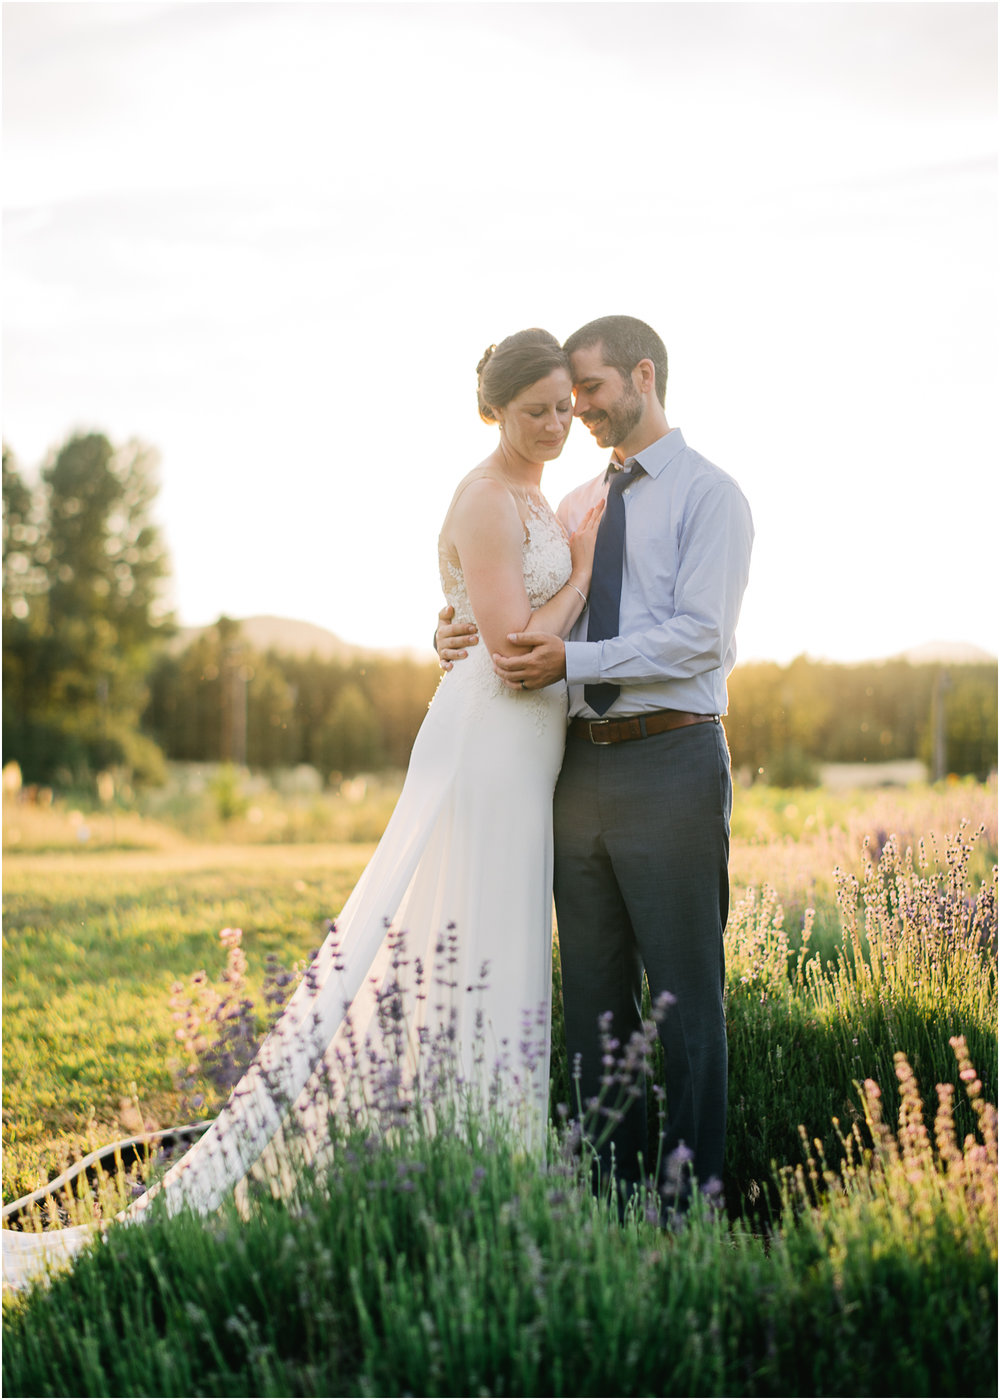 017-portland-wedding-photography-best-2018.jpg